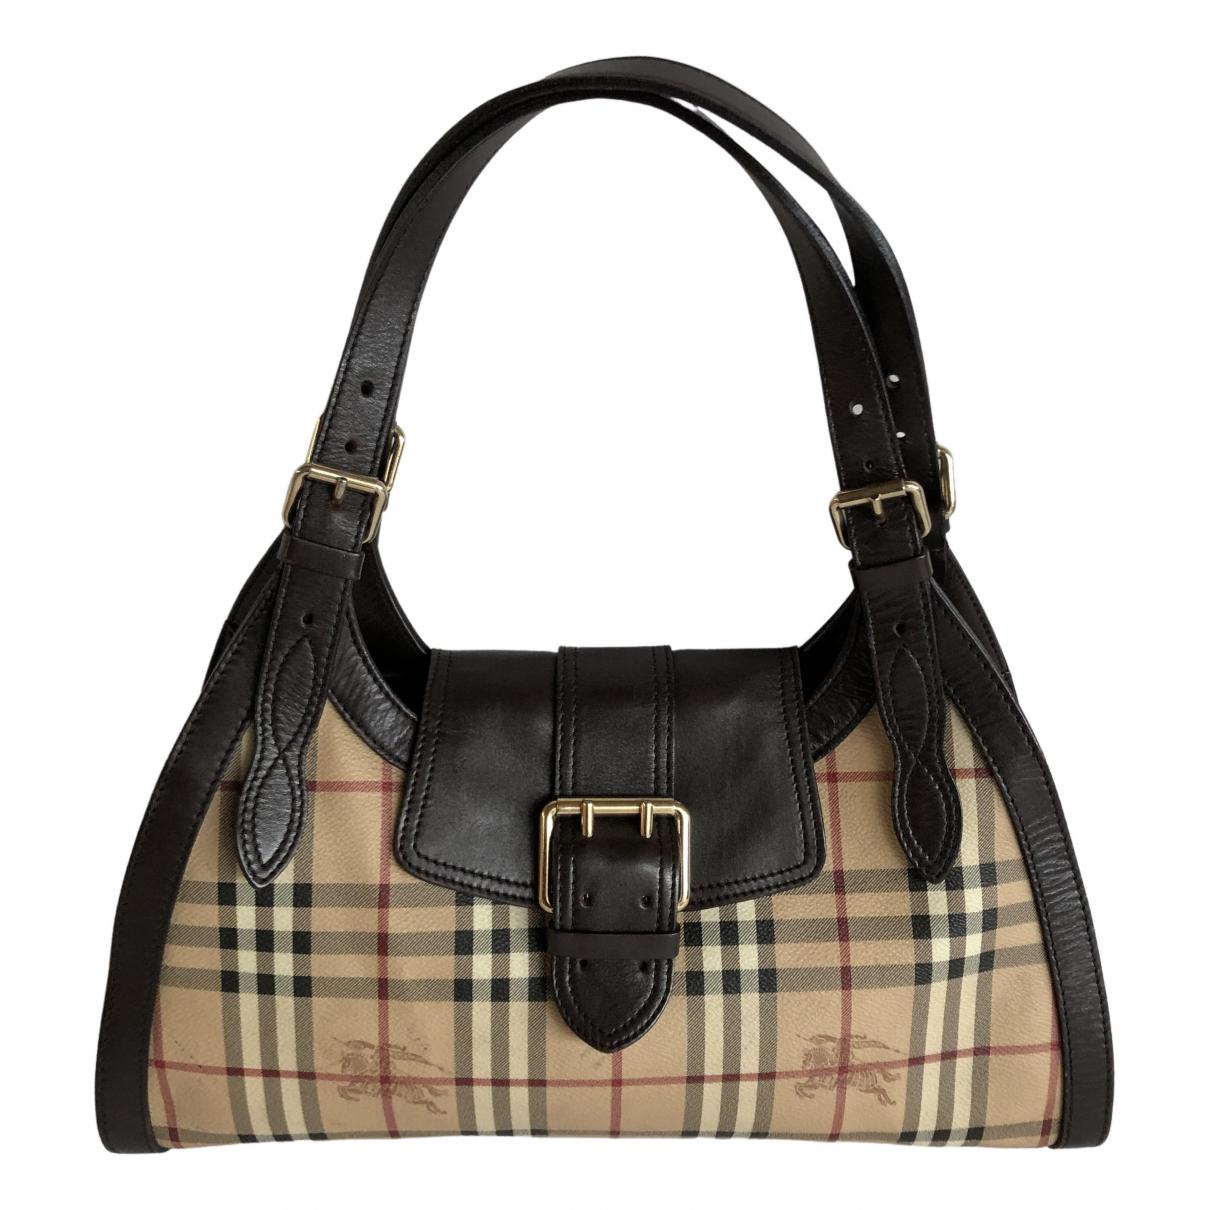 Burberry \N Beige handbag for Women \N